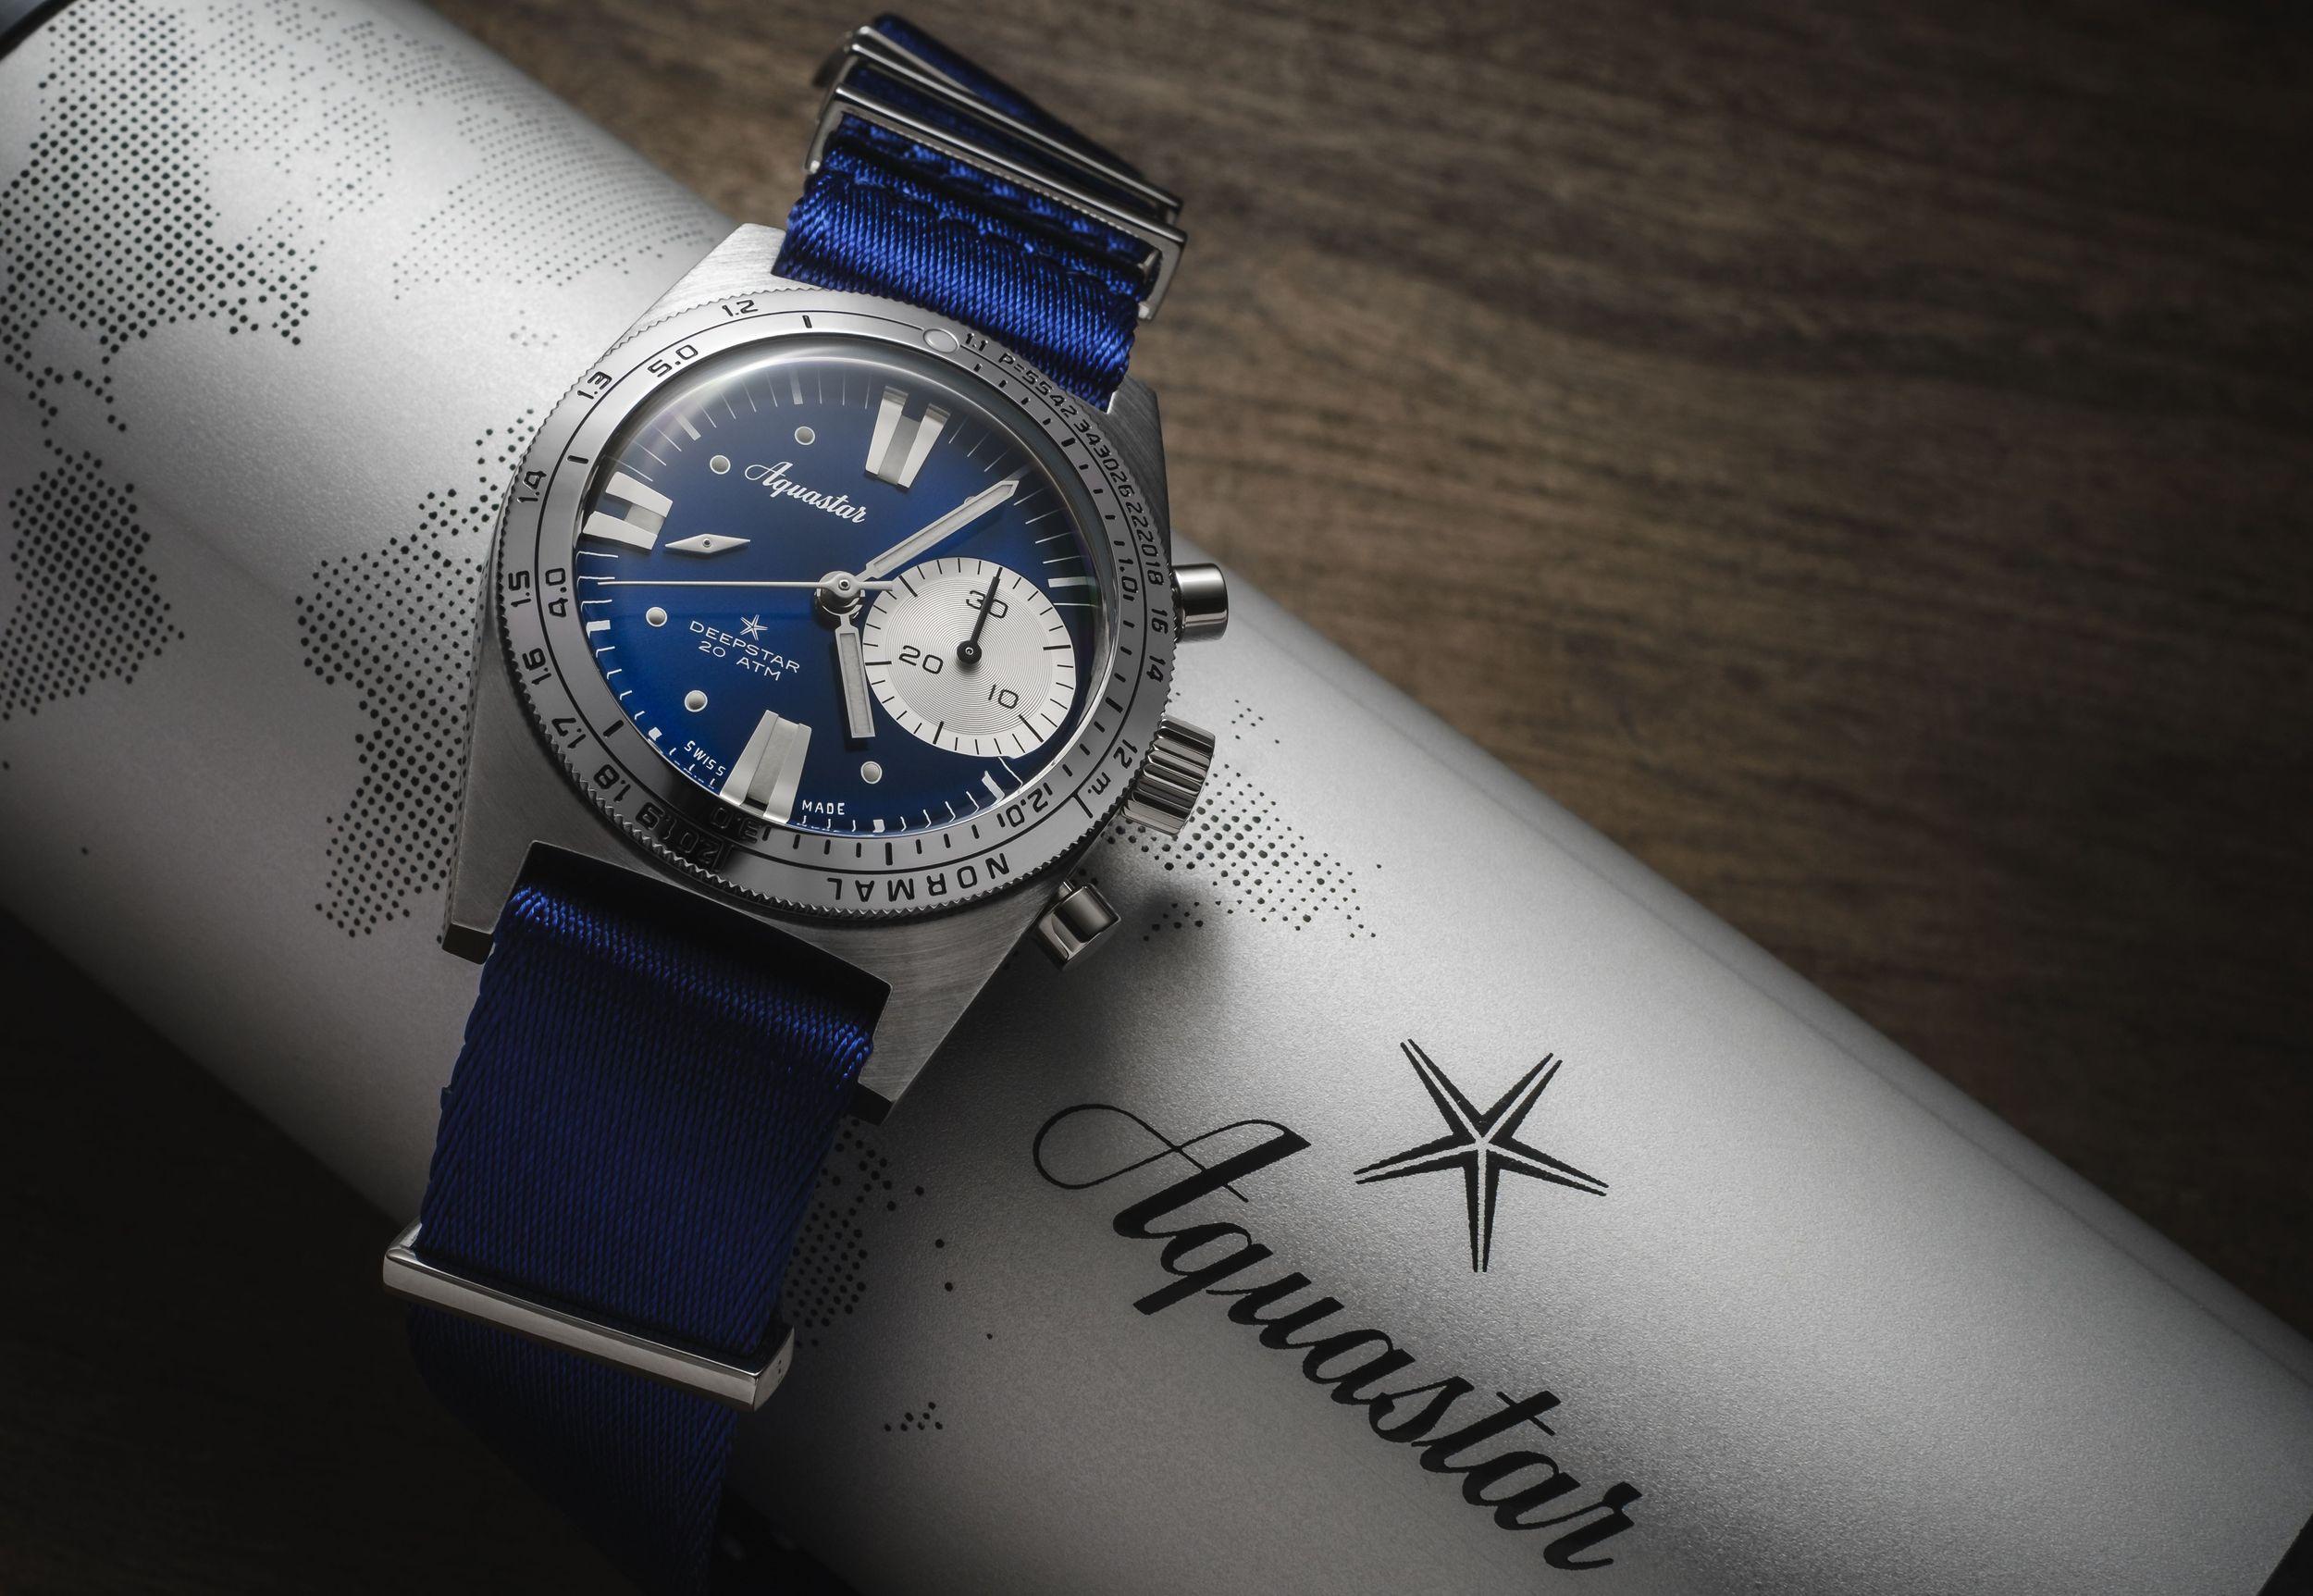 Aquastar Deepstar Chronograph